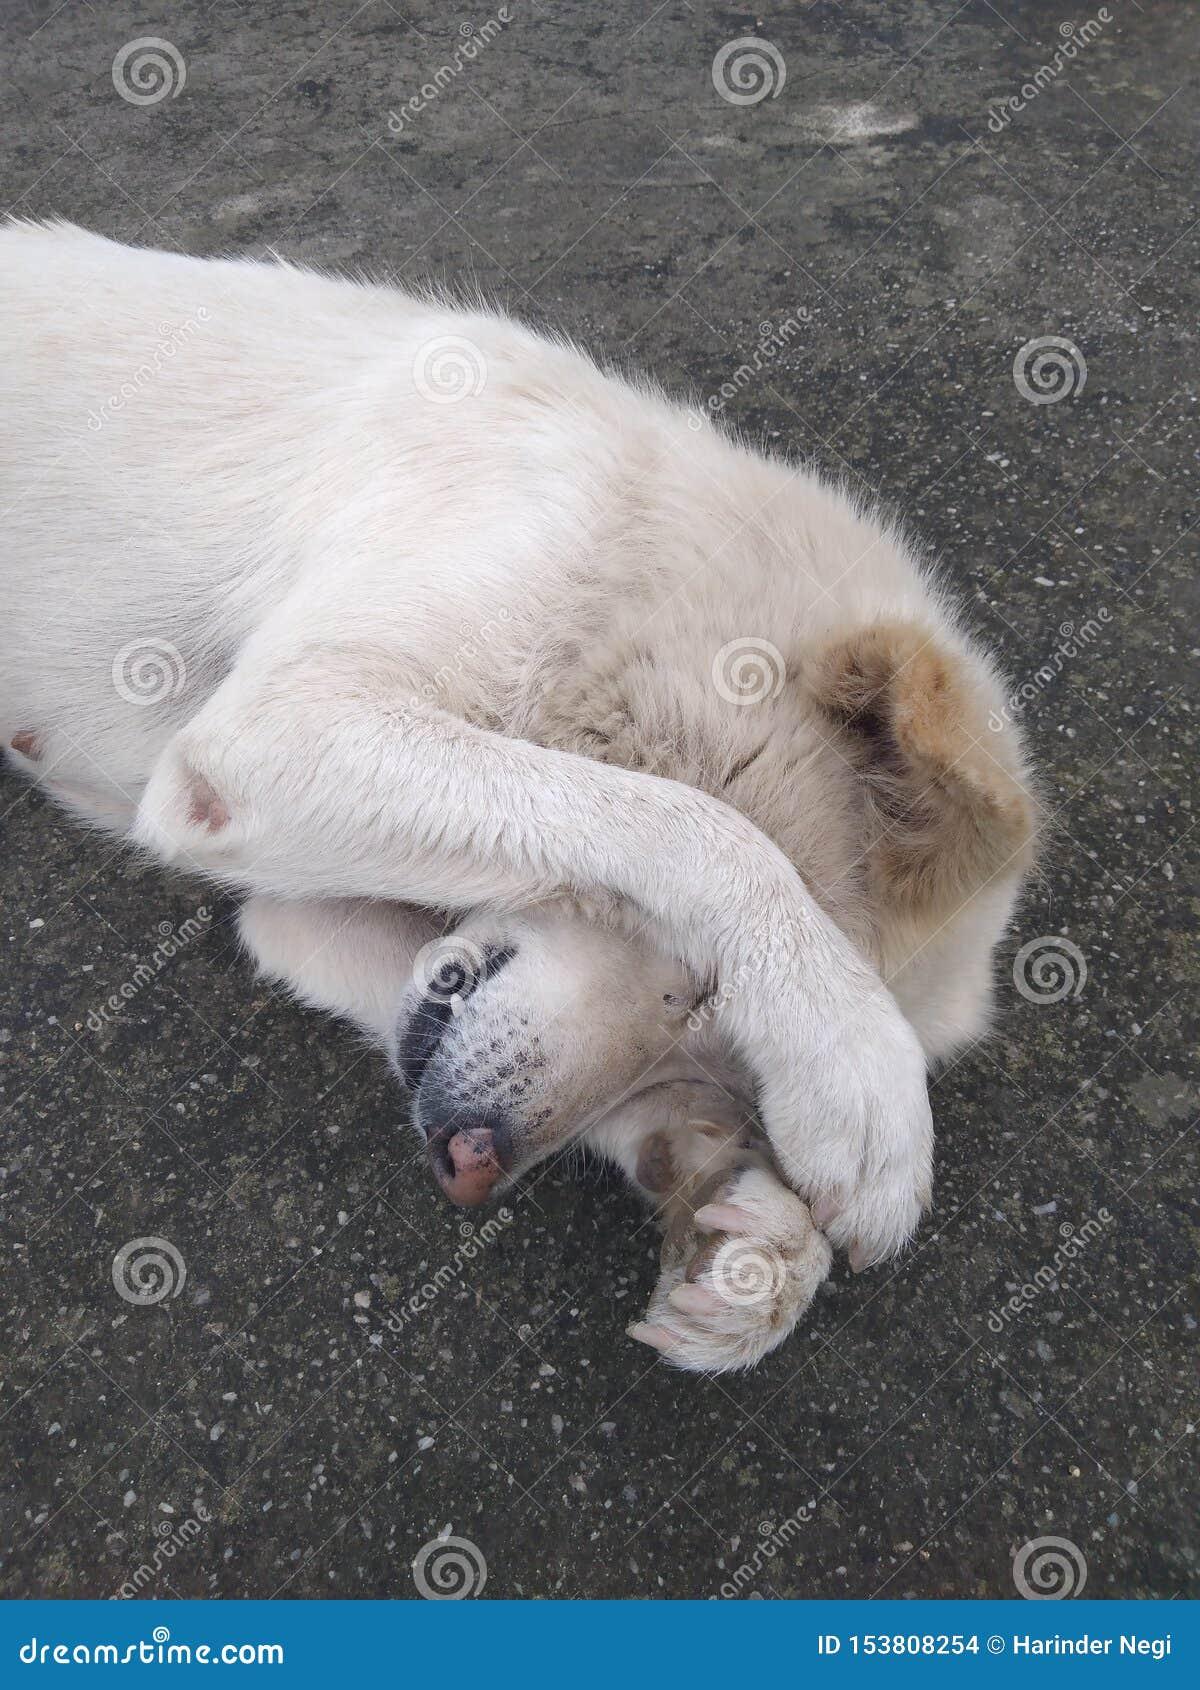 White dog sleeping on the floor